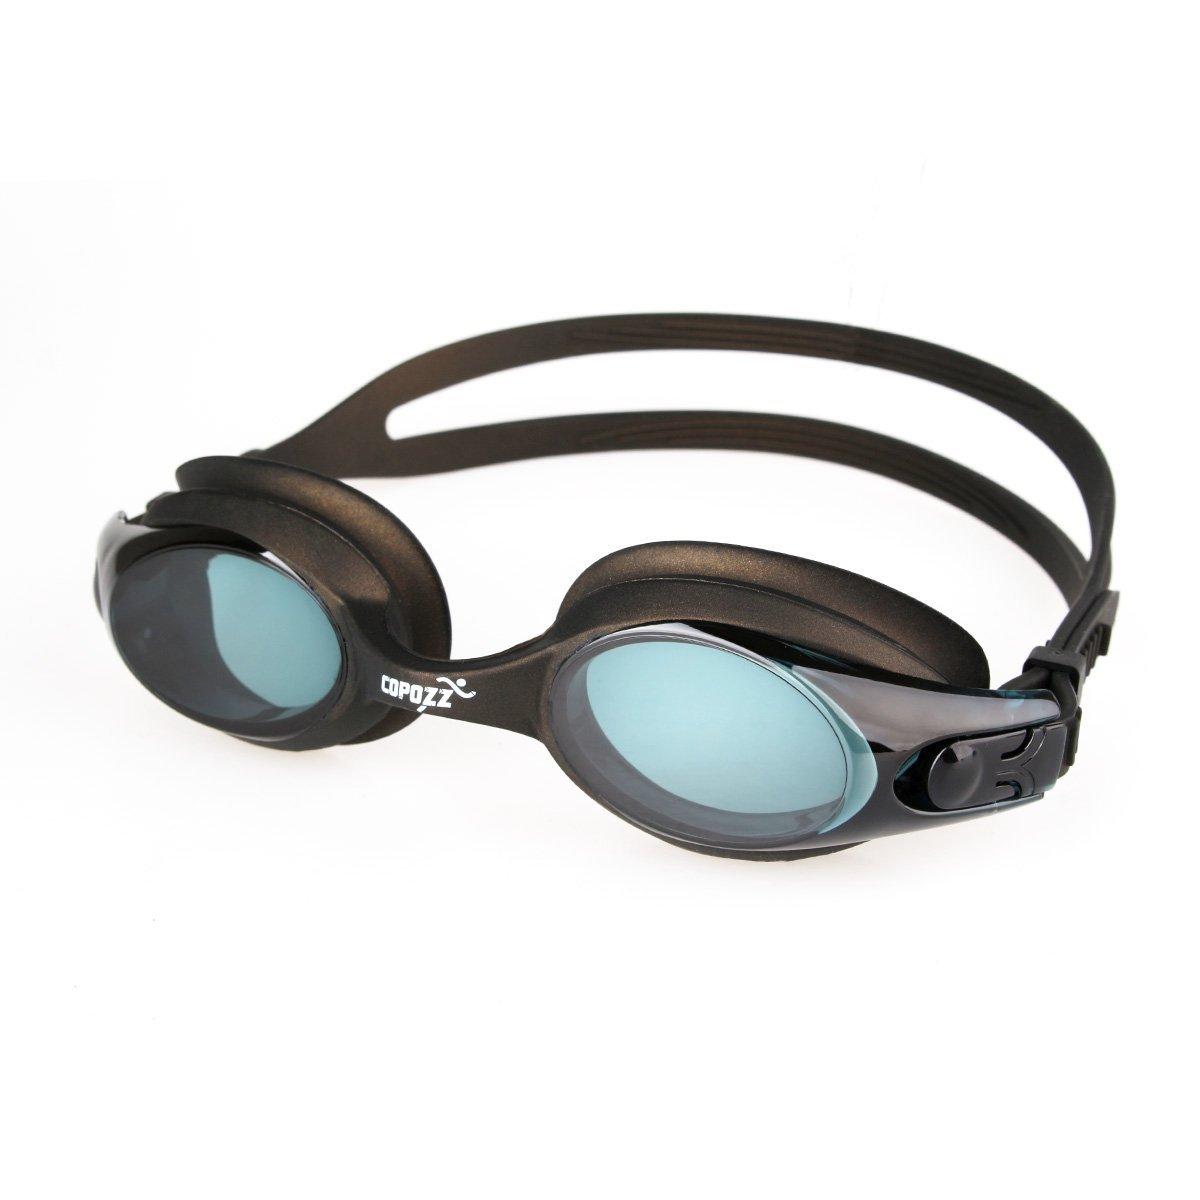 31c3e6d6fb Get Quotations · COPOZZ Prescription Swim Goggle